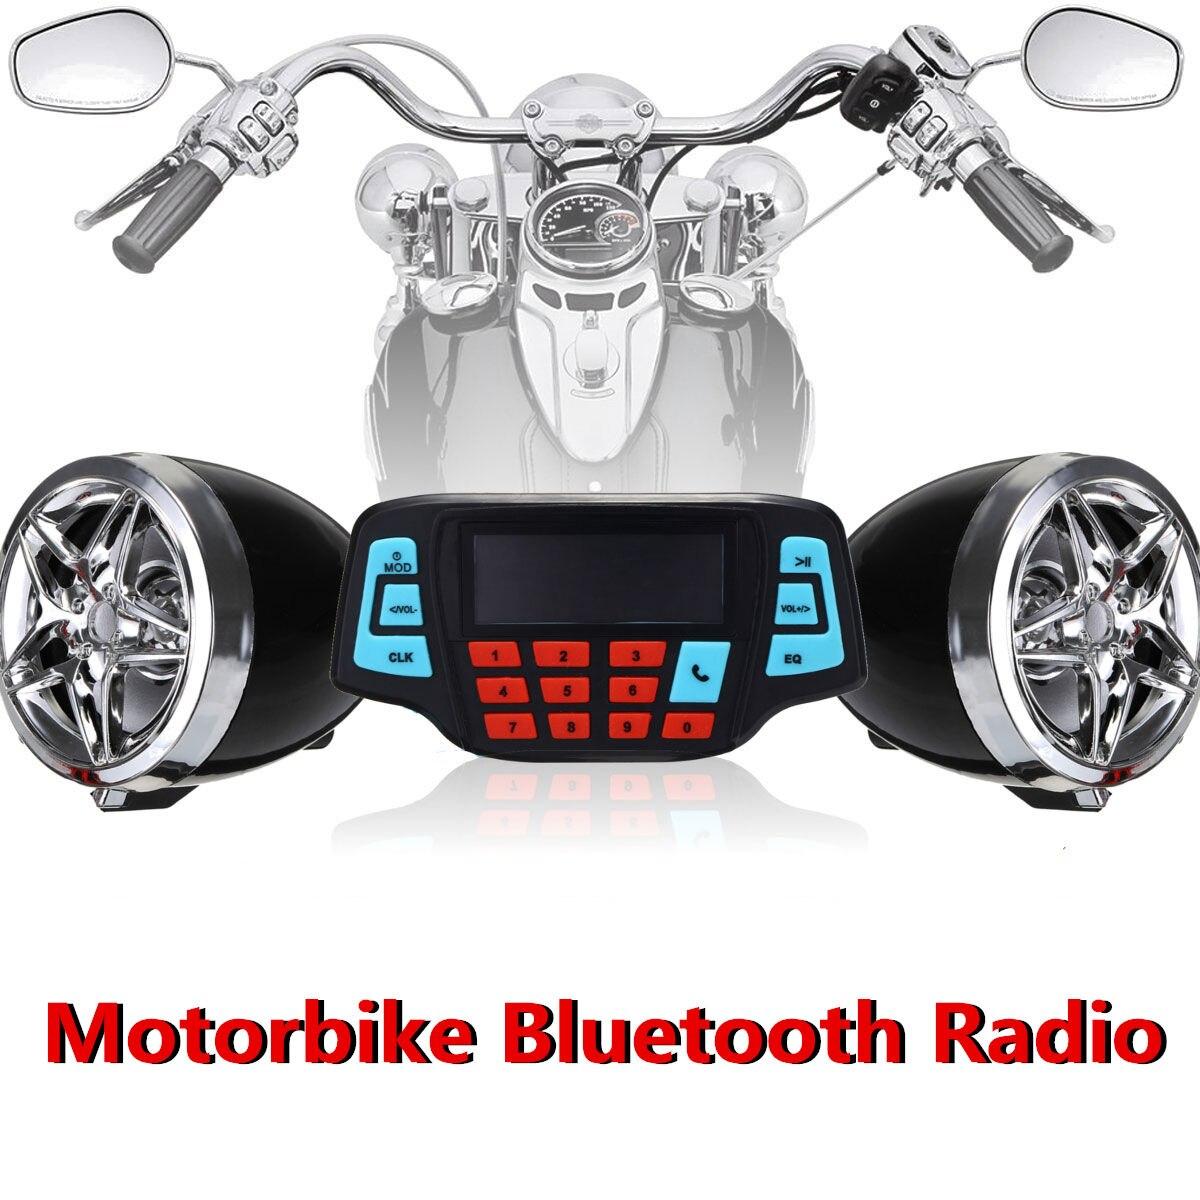 Mofaner 12V Waterproof Motorcycle Bluetooth Radio Motorbike ATV MP3 Player Two Speaker Handlebar Radio For Honda For Kawasaki цена